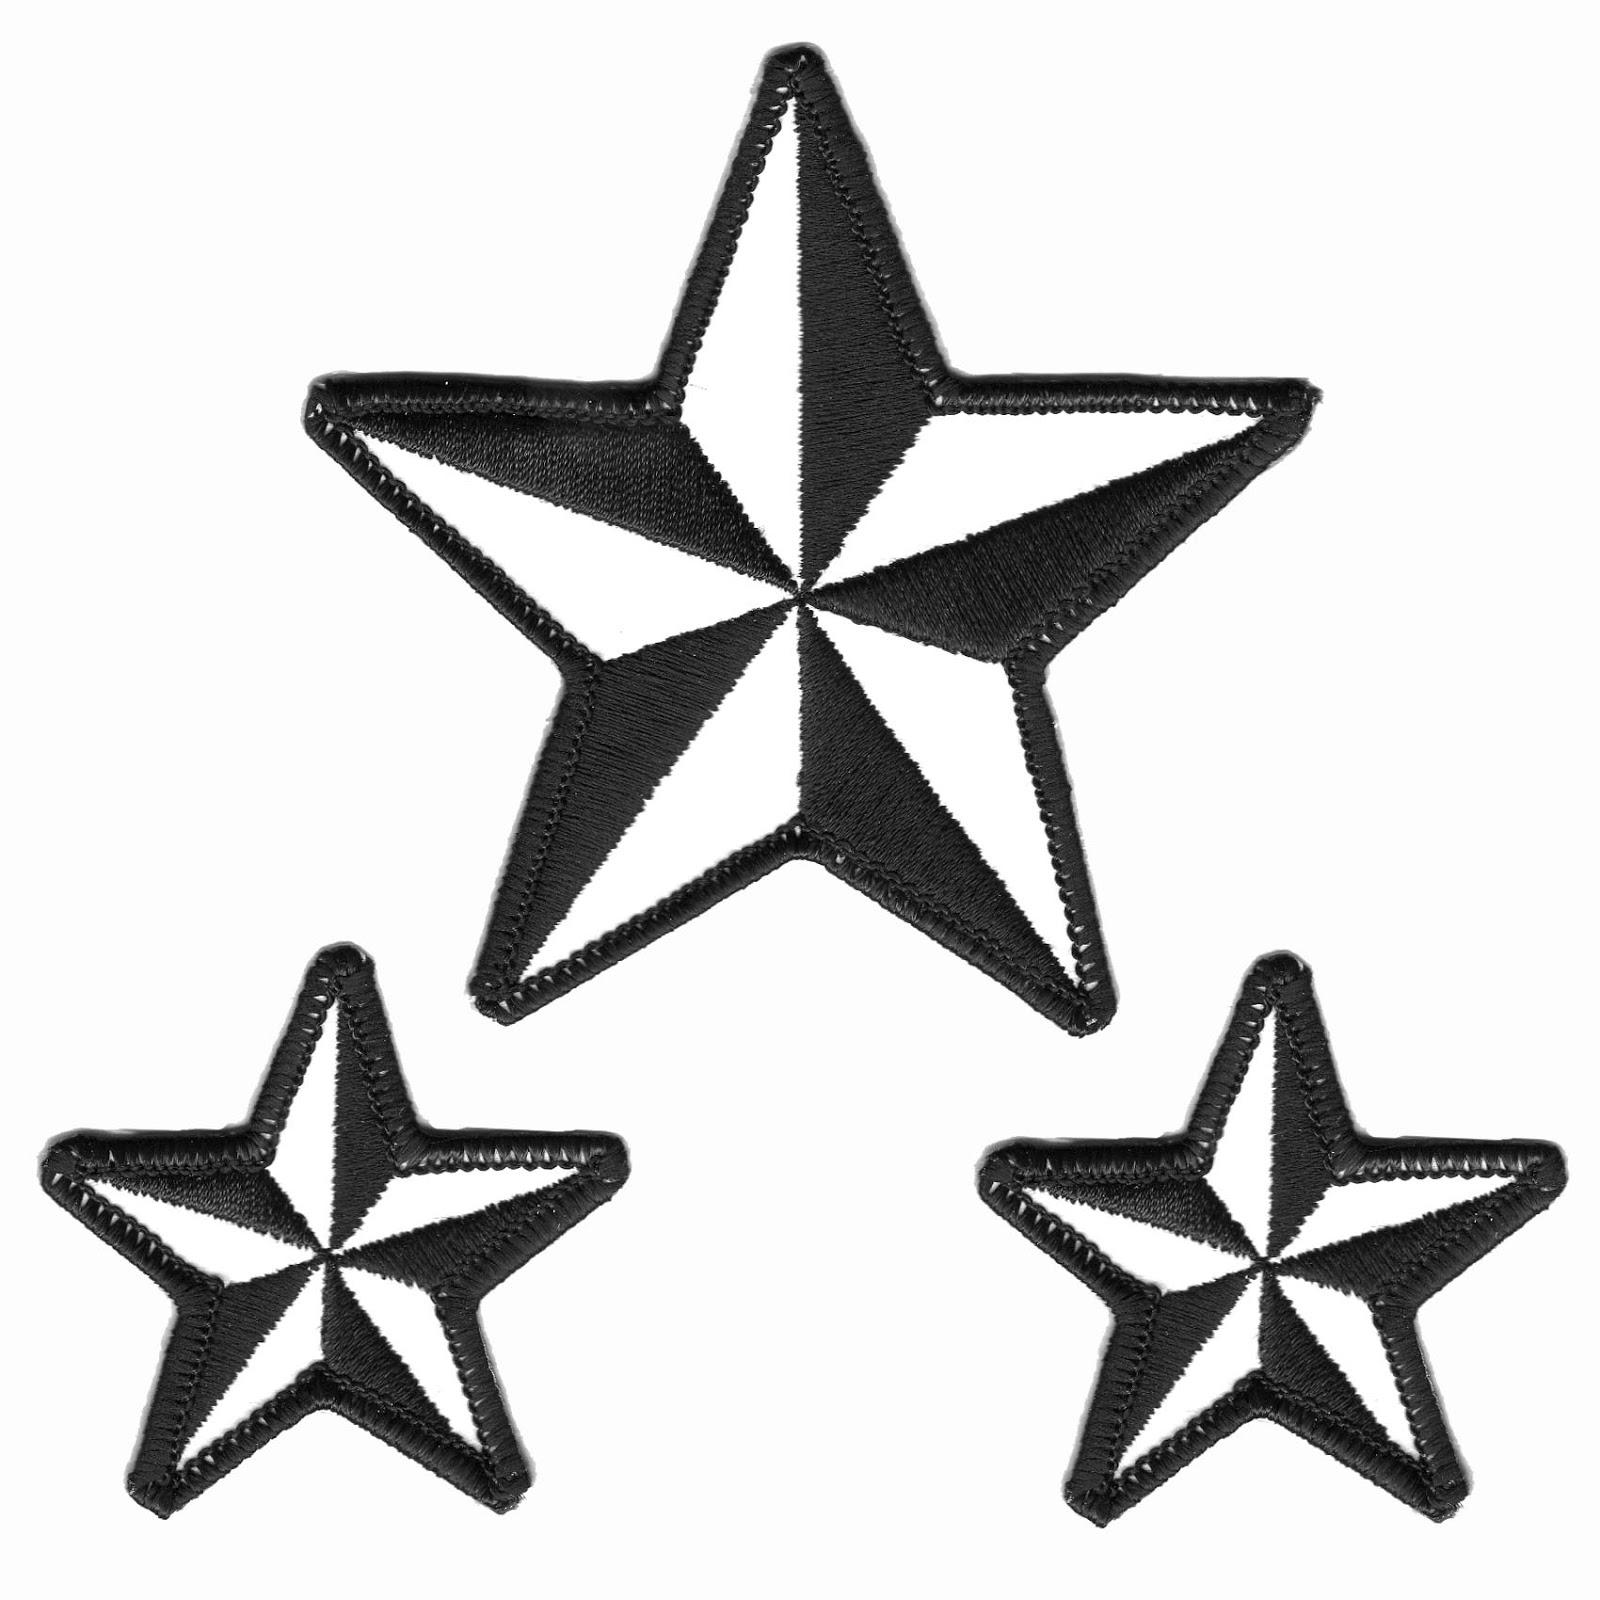 Star Black And White Star Clipart Black -Star black and white star clipart black and white 2-11